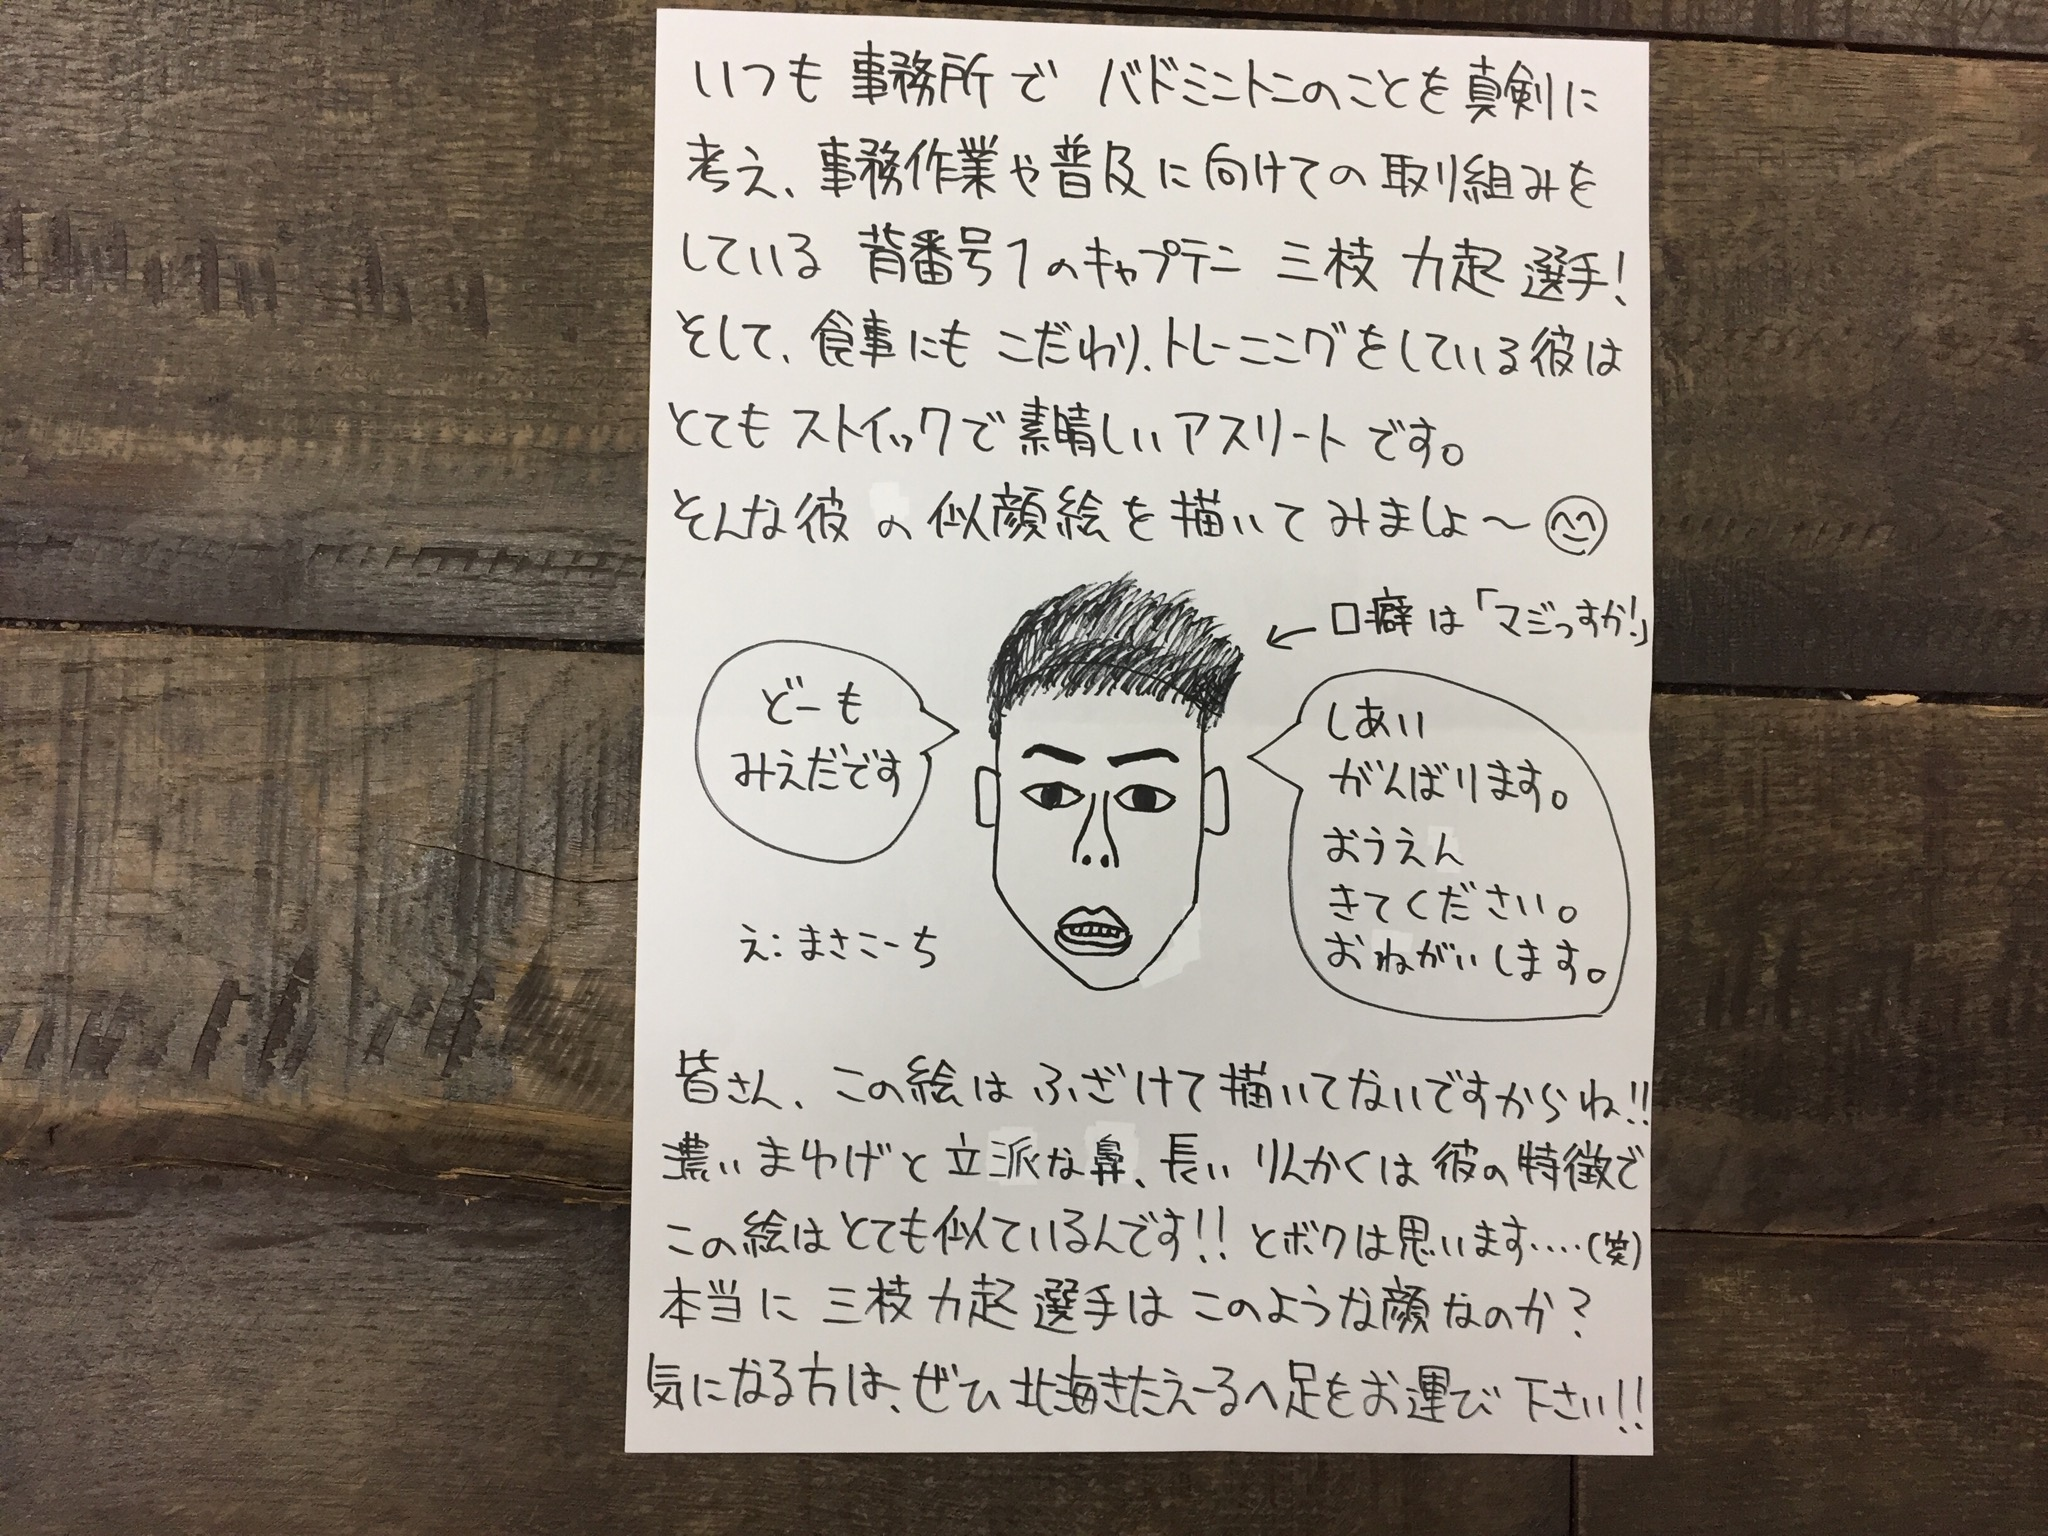 http://chsc.jp/report/up_images/F682C3D8-163B-4F0C-B6A7-9F40283BEF69.jpeg